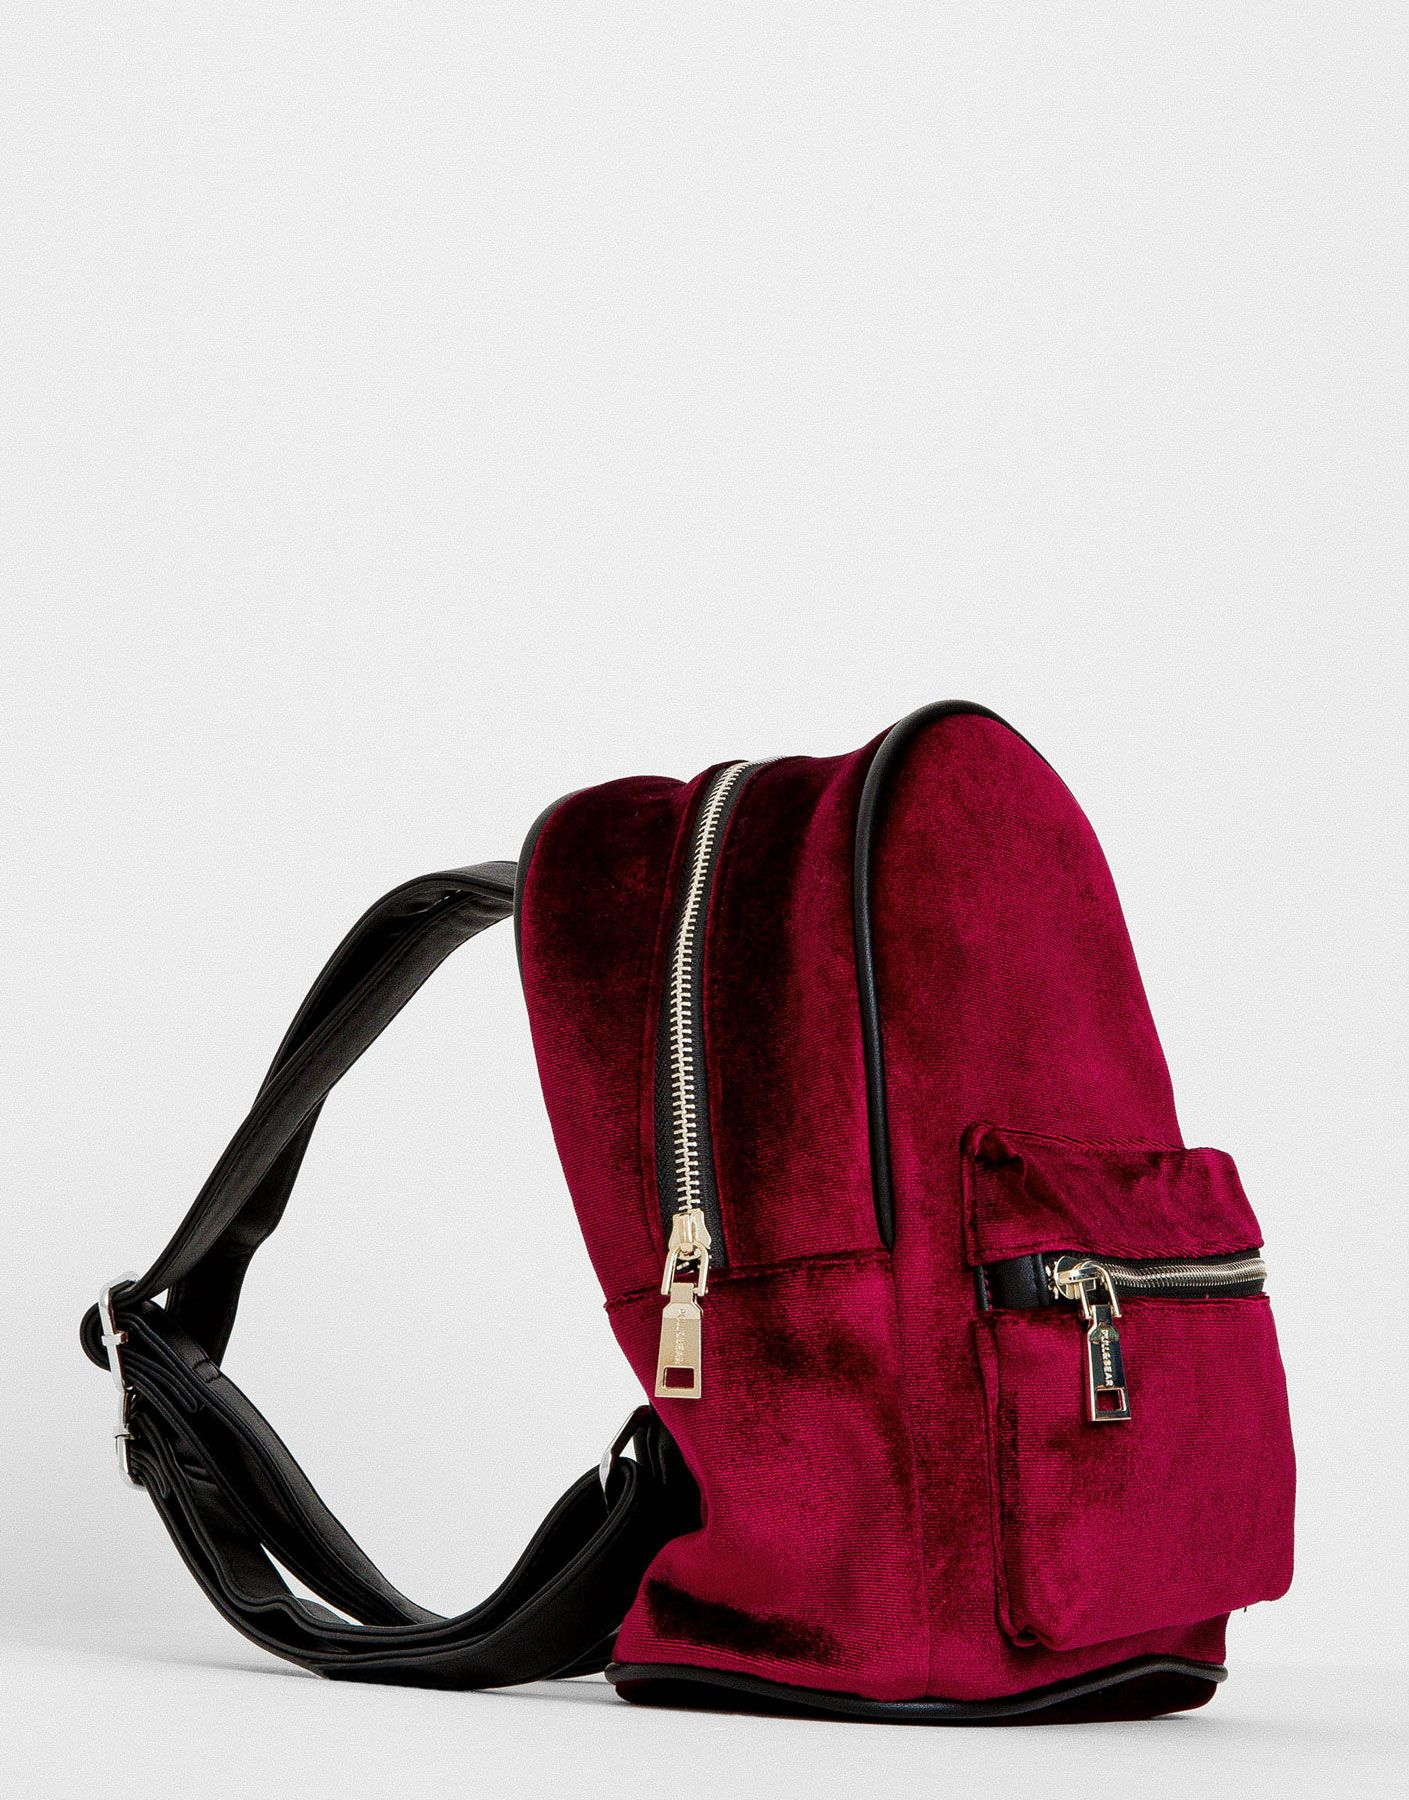 Kadife Sirt Cantasi Cantalar Aksesuarlar Kadin Pull Bear Turkiye Leather Backpack Leather Bags